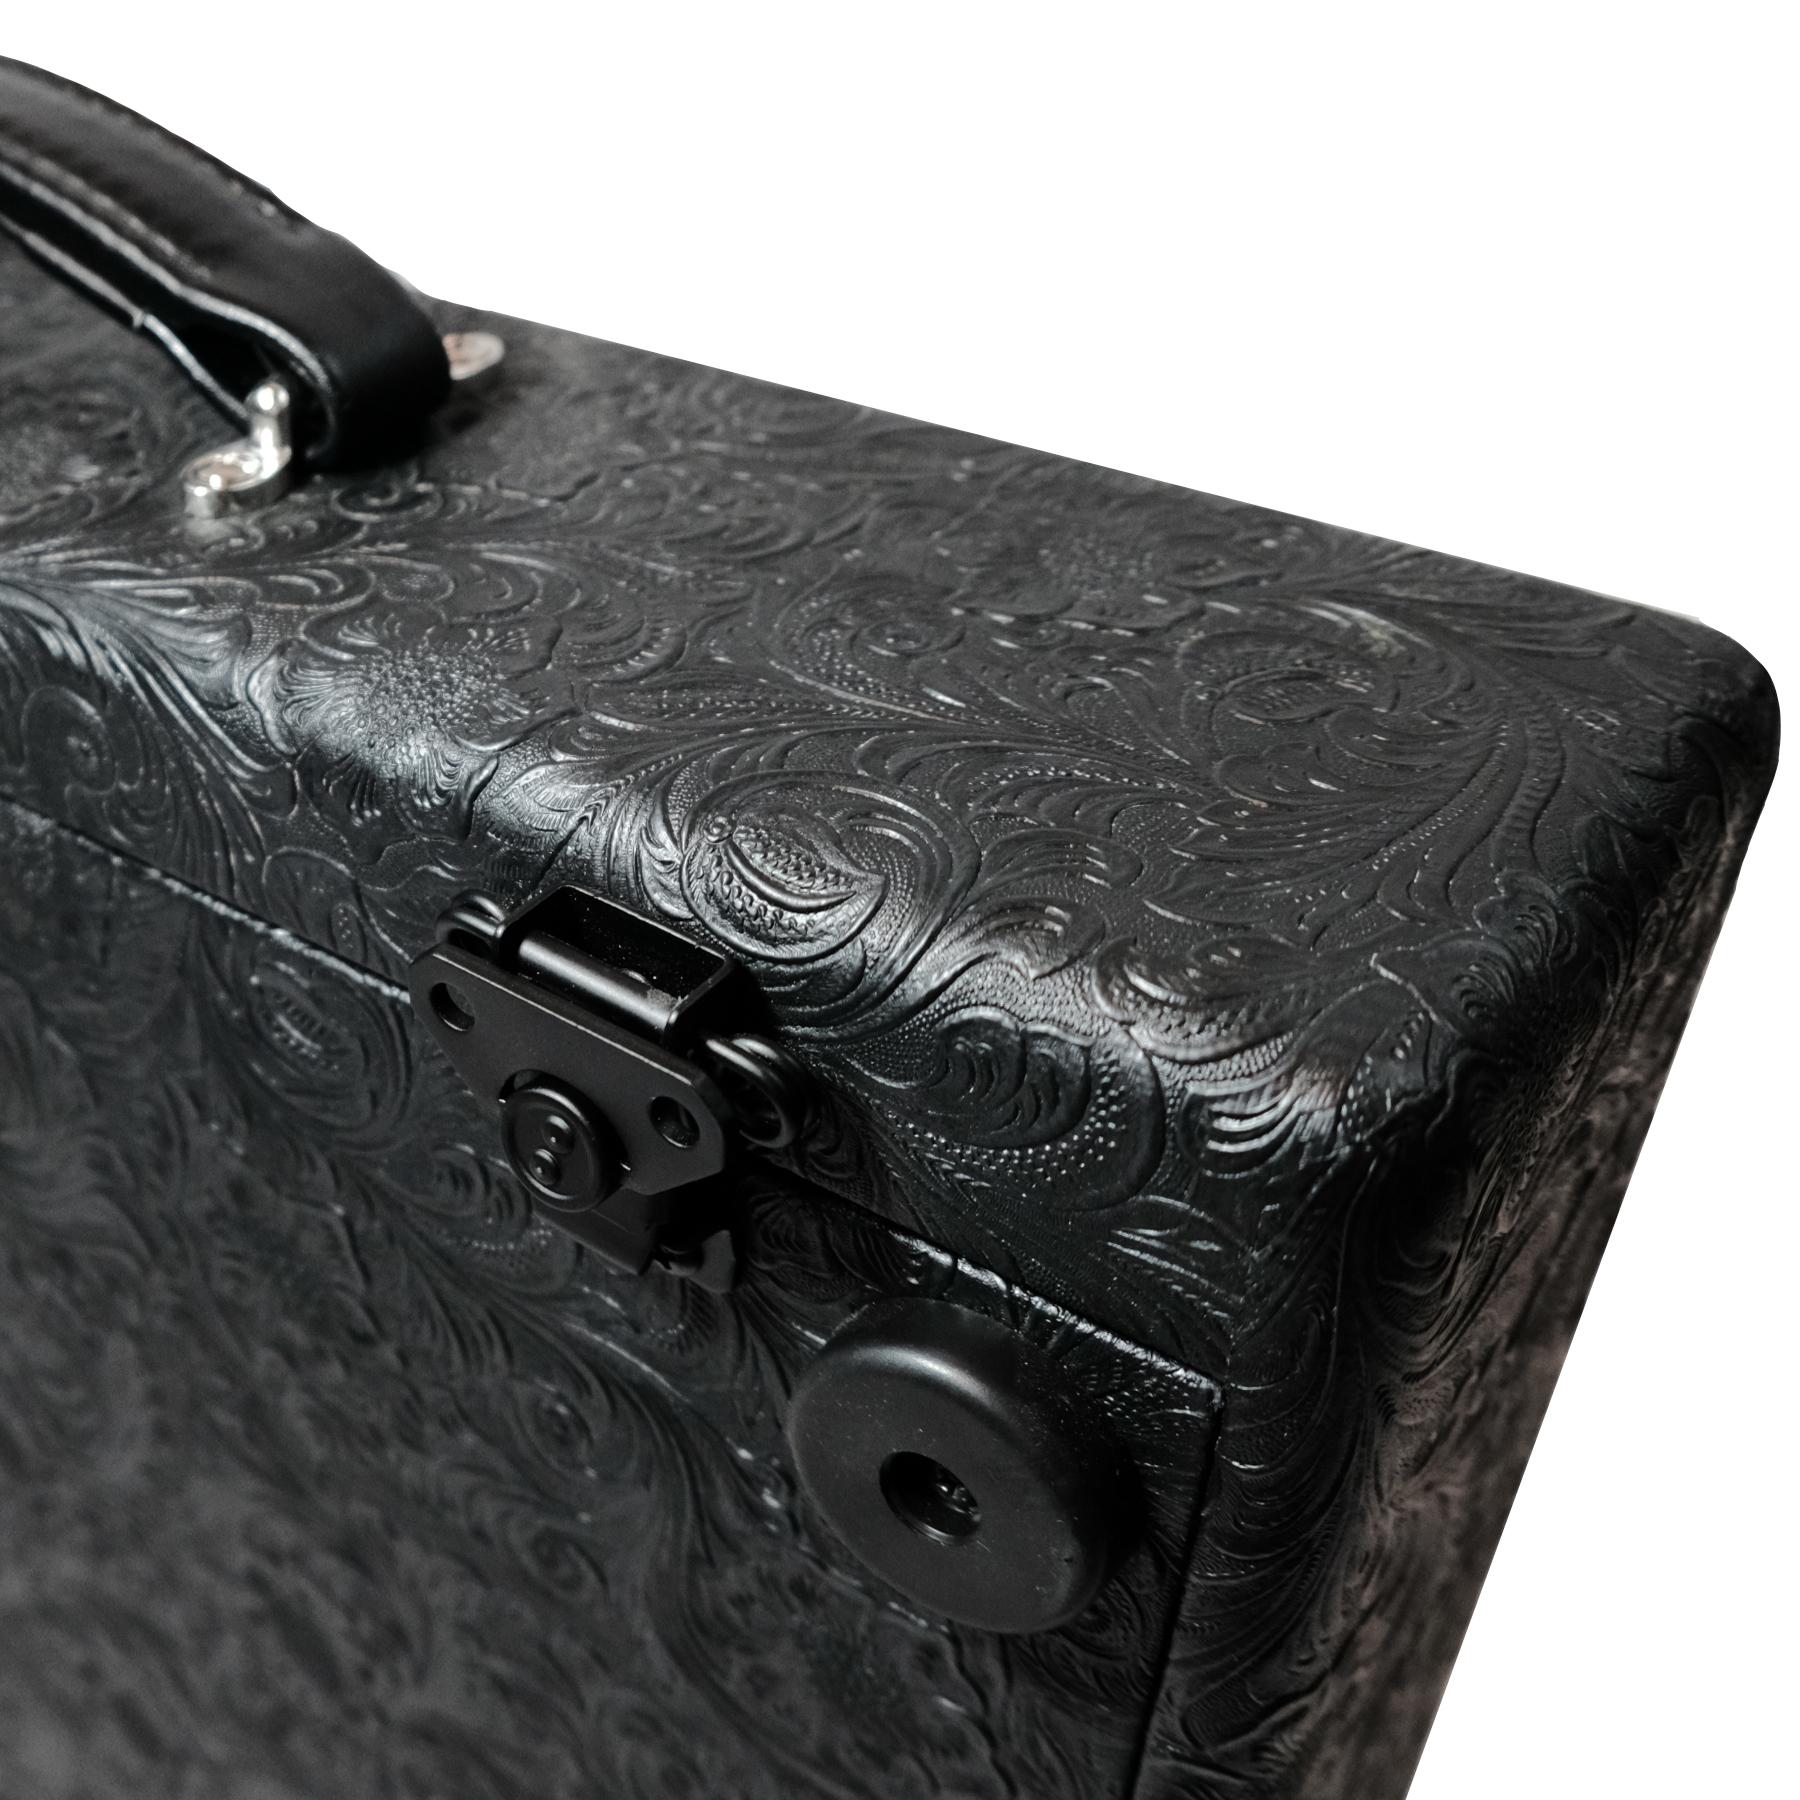 Vboutique 12 x 20 modern vintage suitcase board